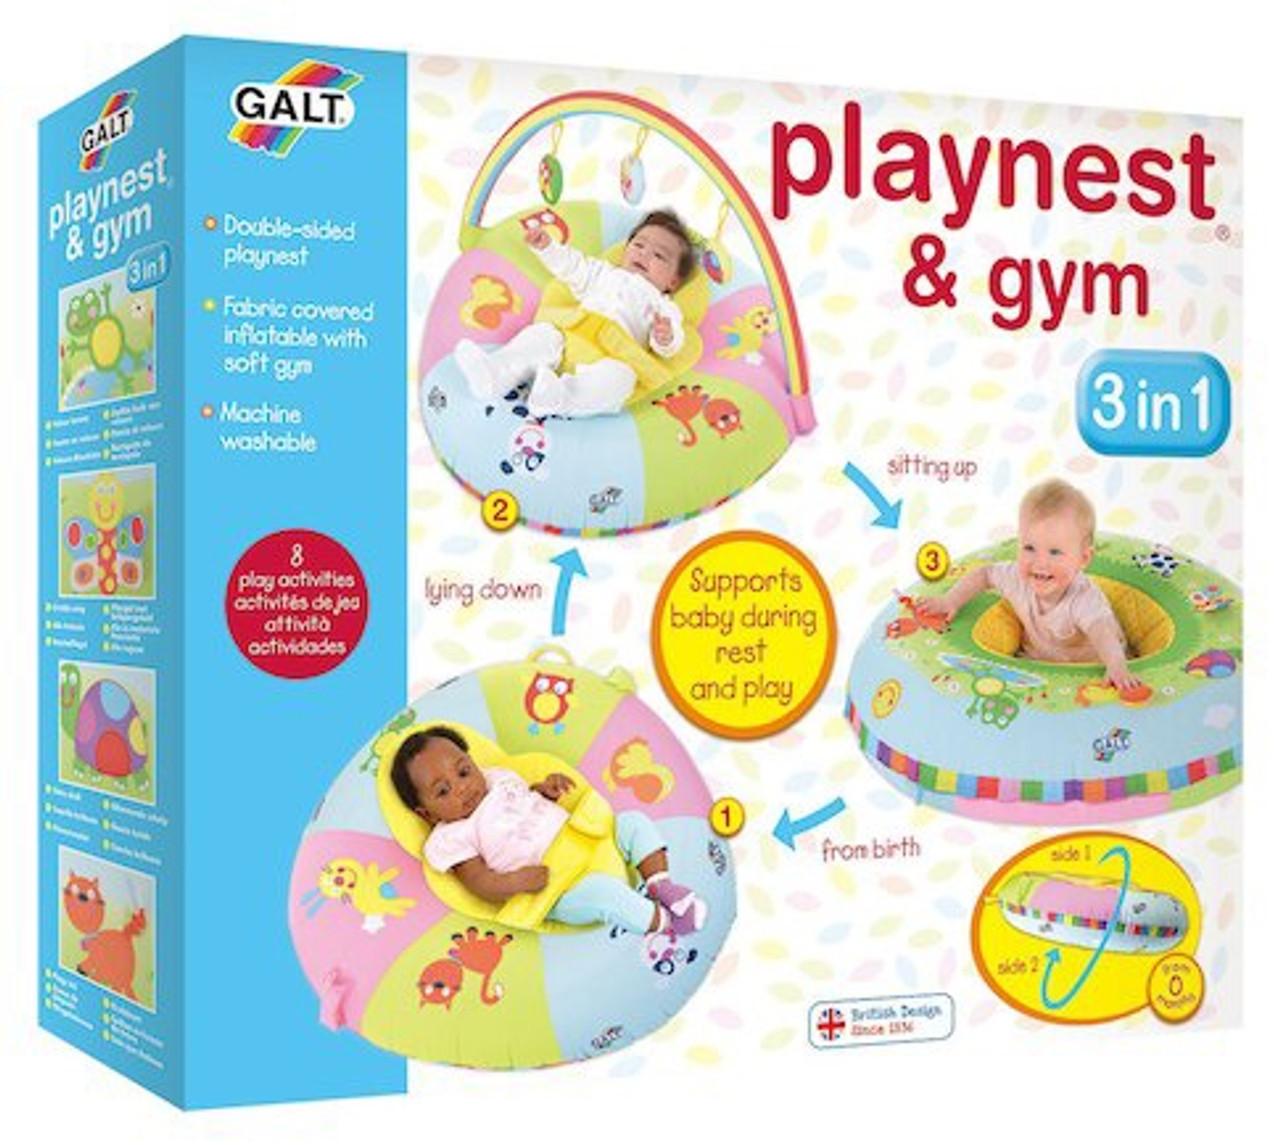 PLAYNEST & GYM